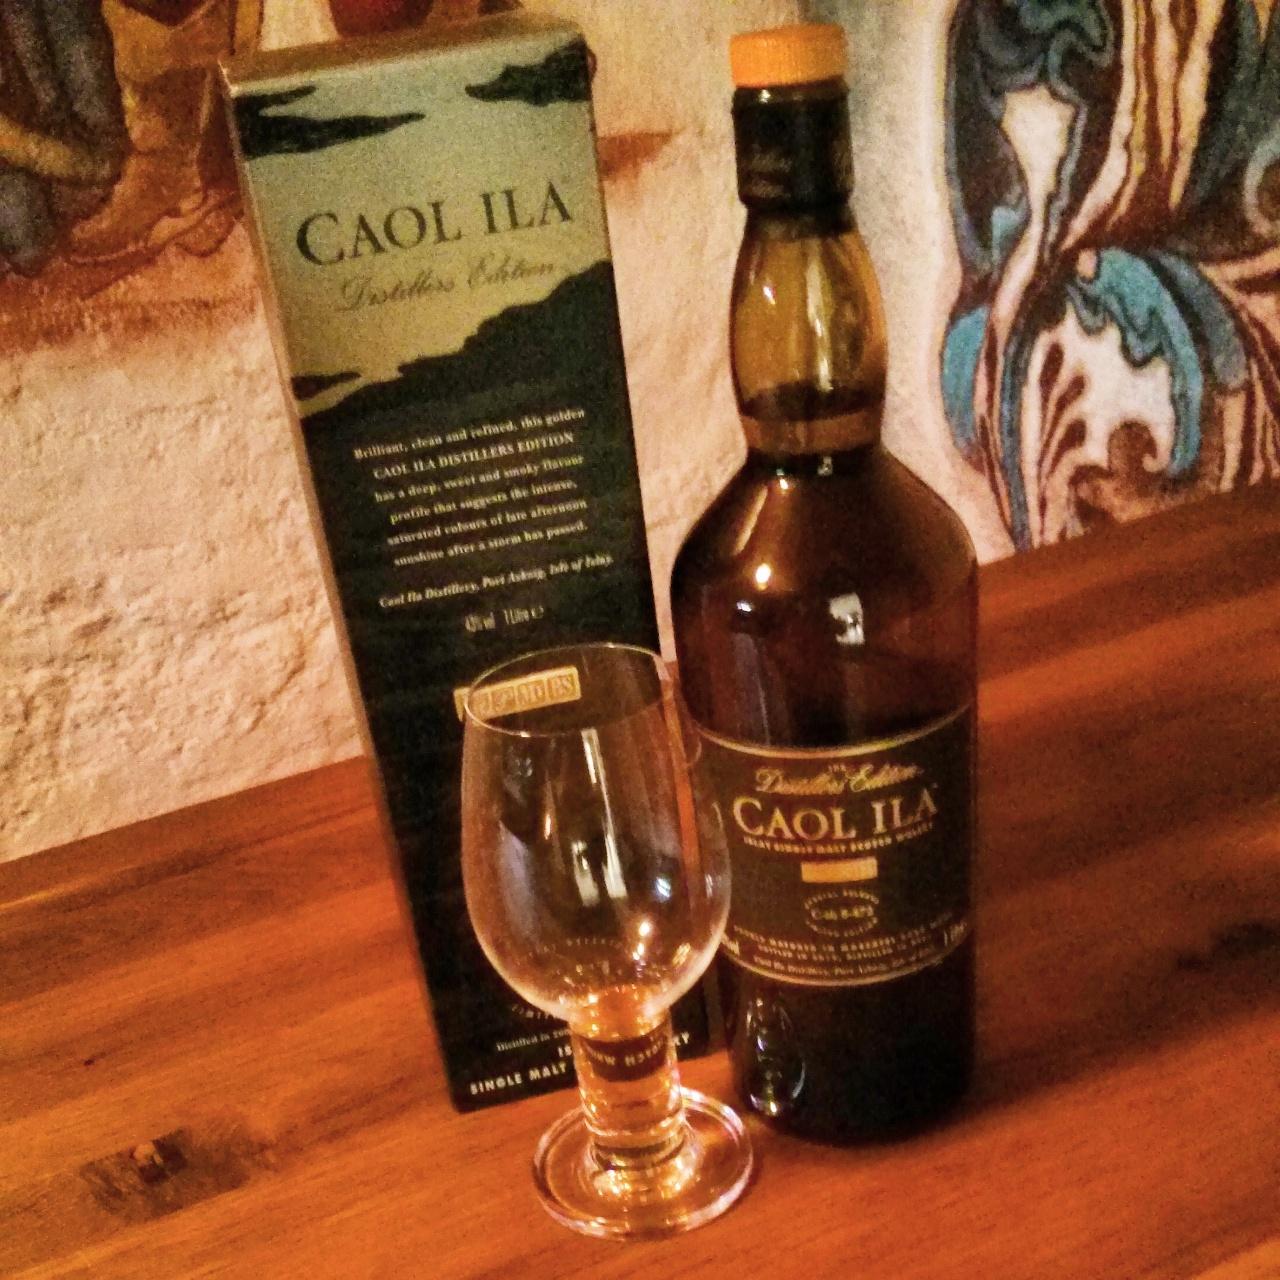 Caol Ila Destillers limited editon 2000/2012 8/472